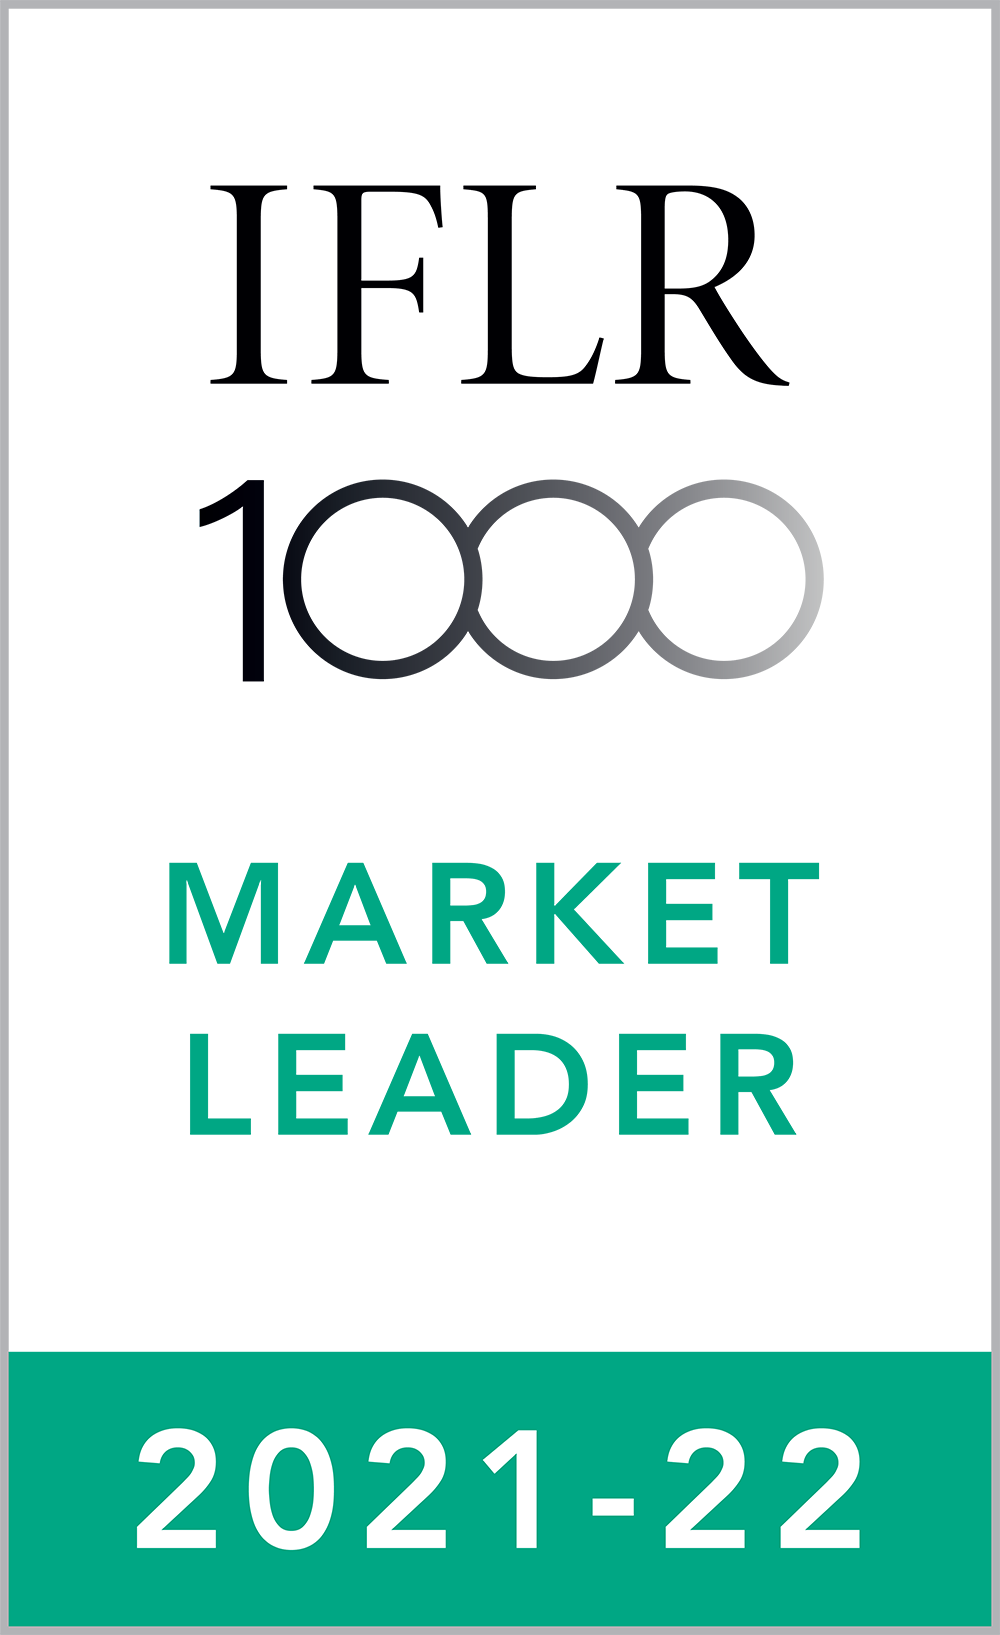 IFLR Market Leader 2021-22